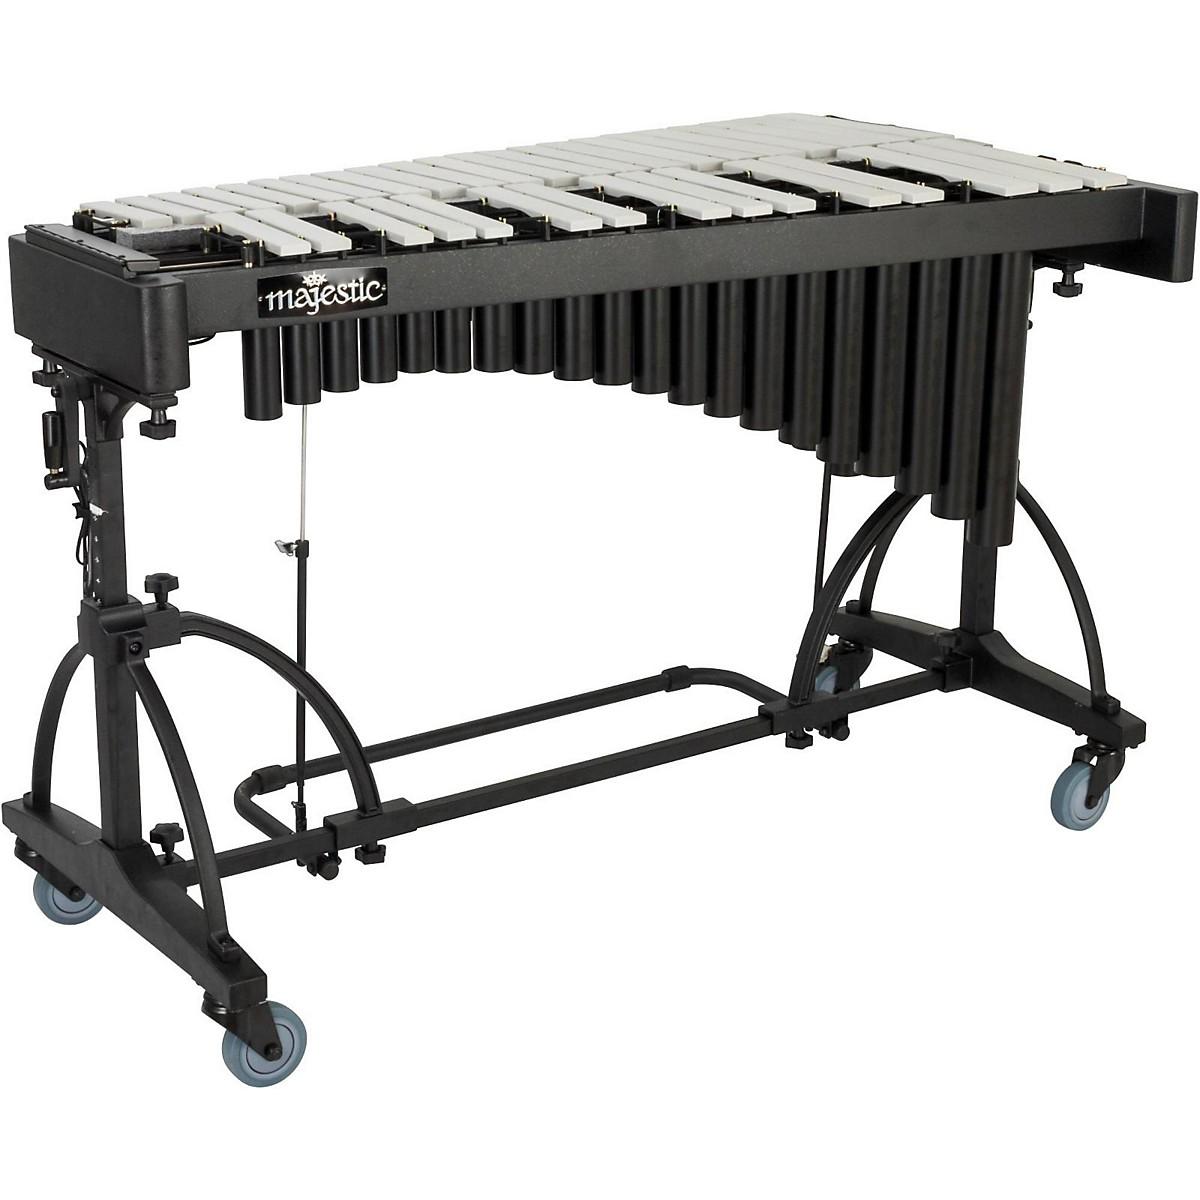 Majestic 3-Octave Deluxe Vibraphone